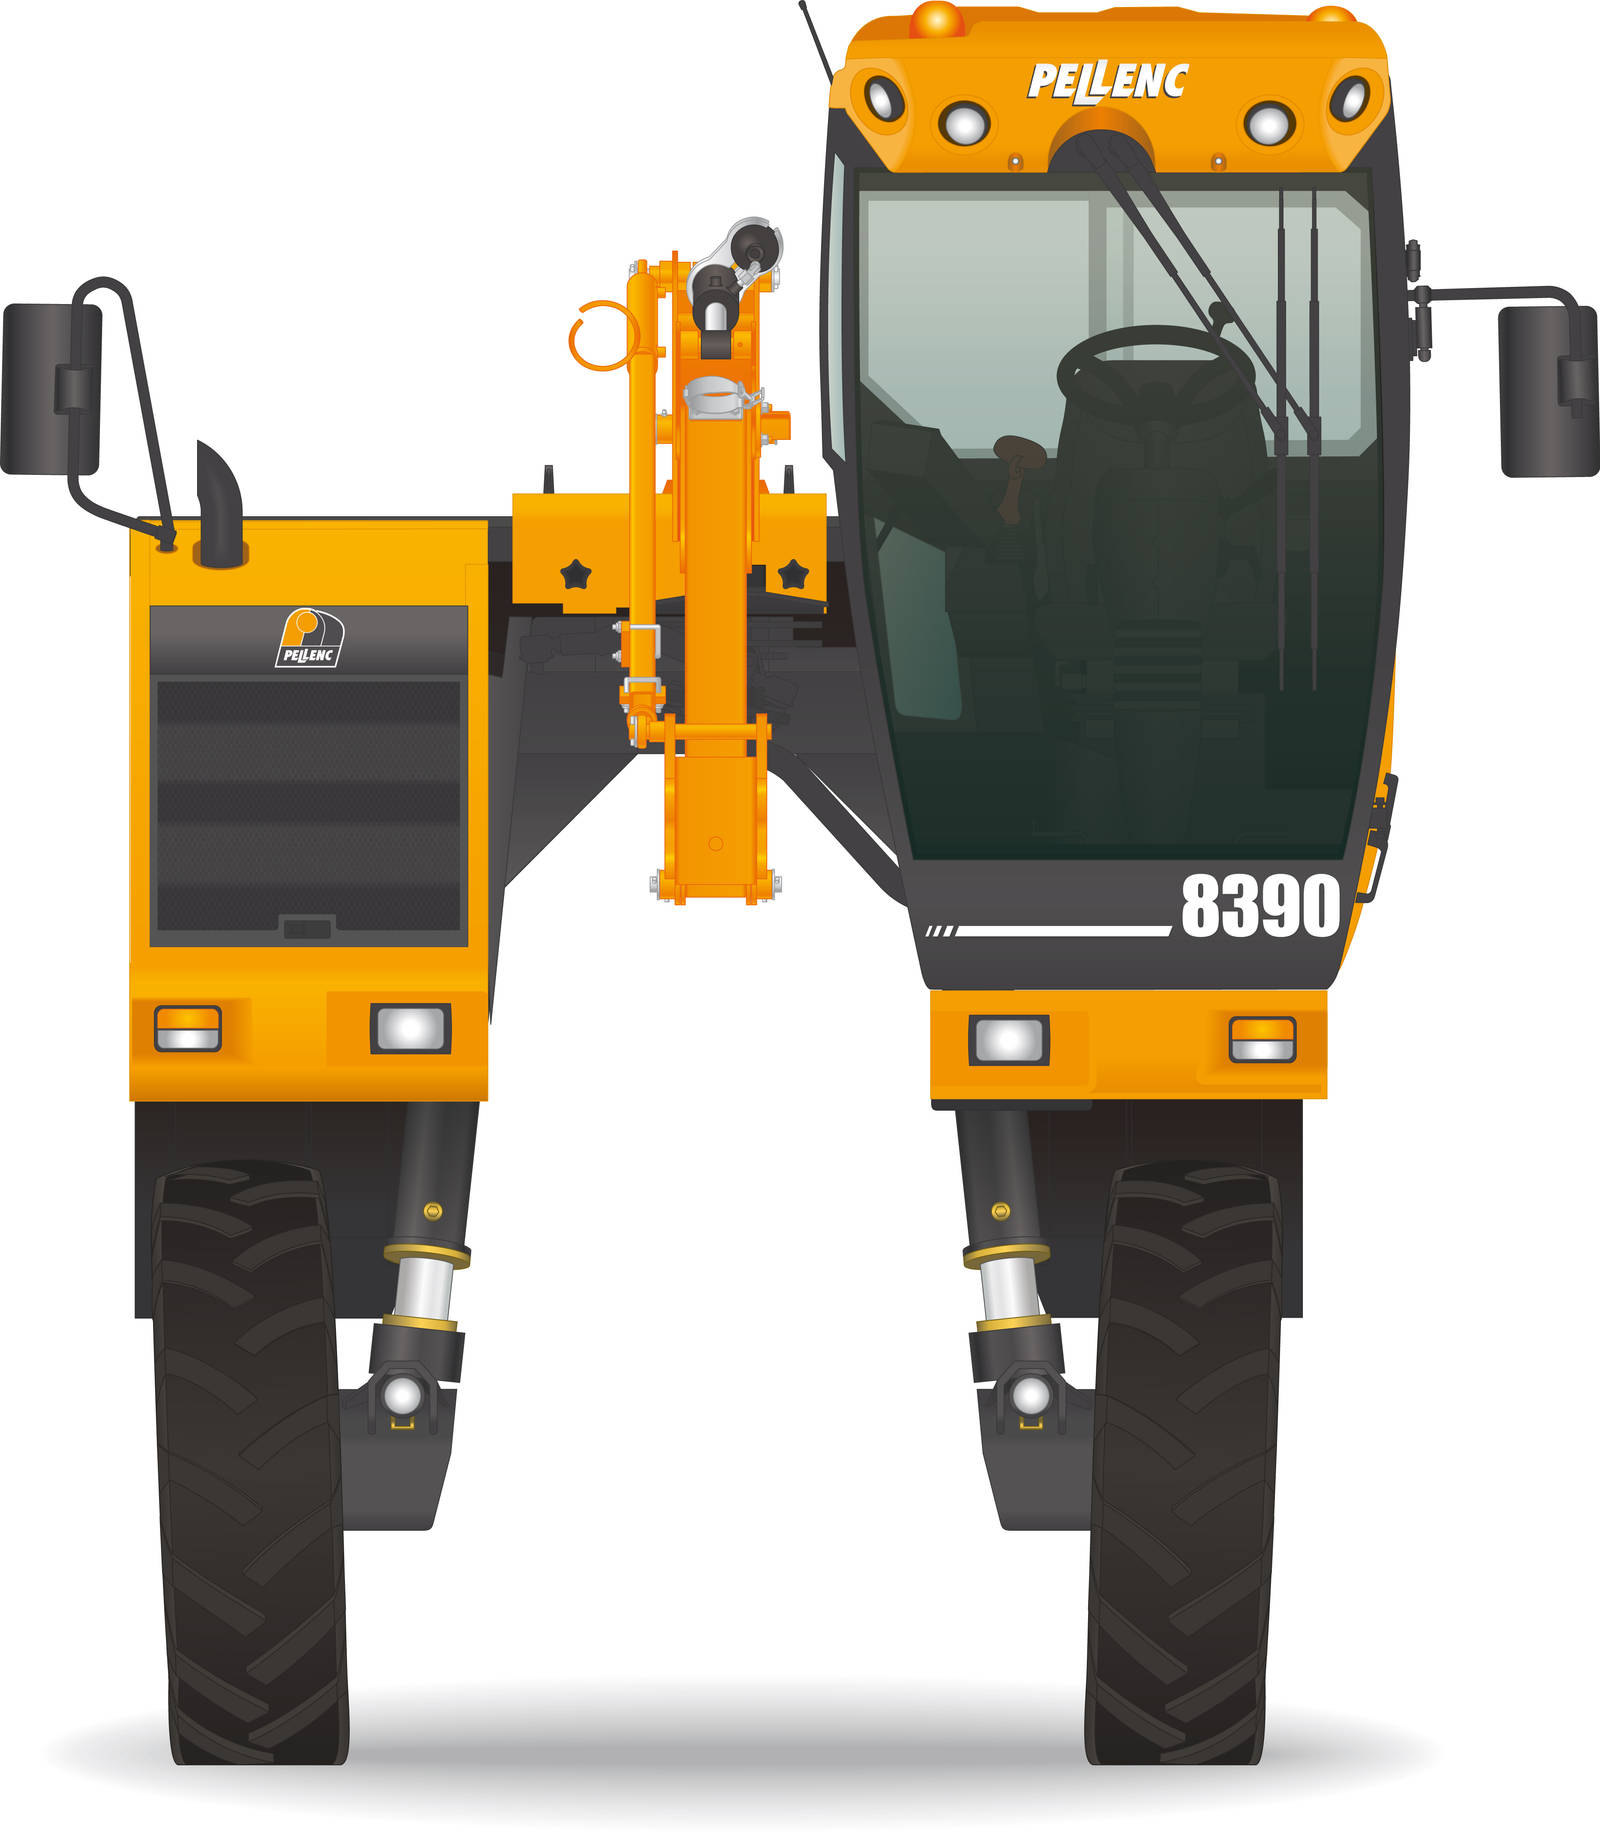 Pellenc Tractor 2 by BolFAB